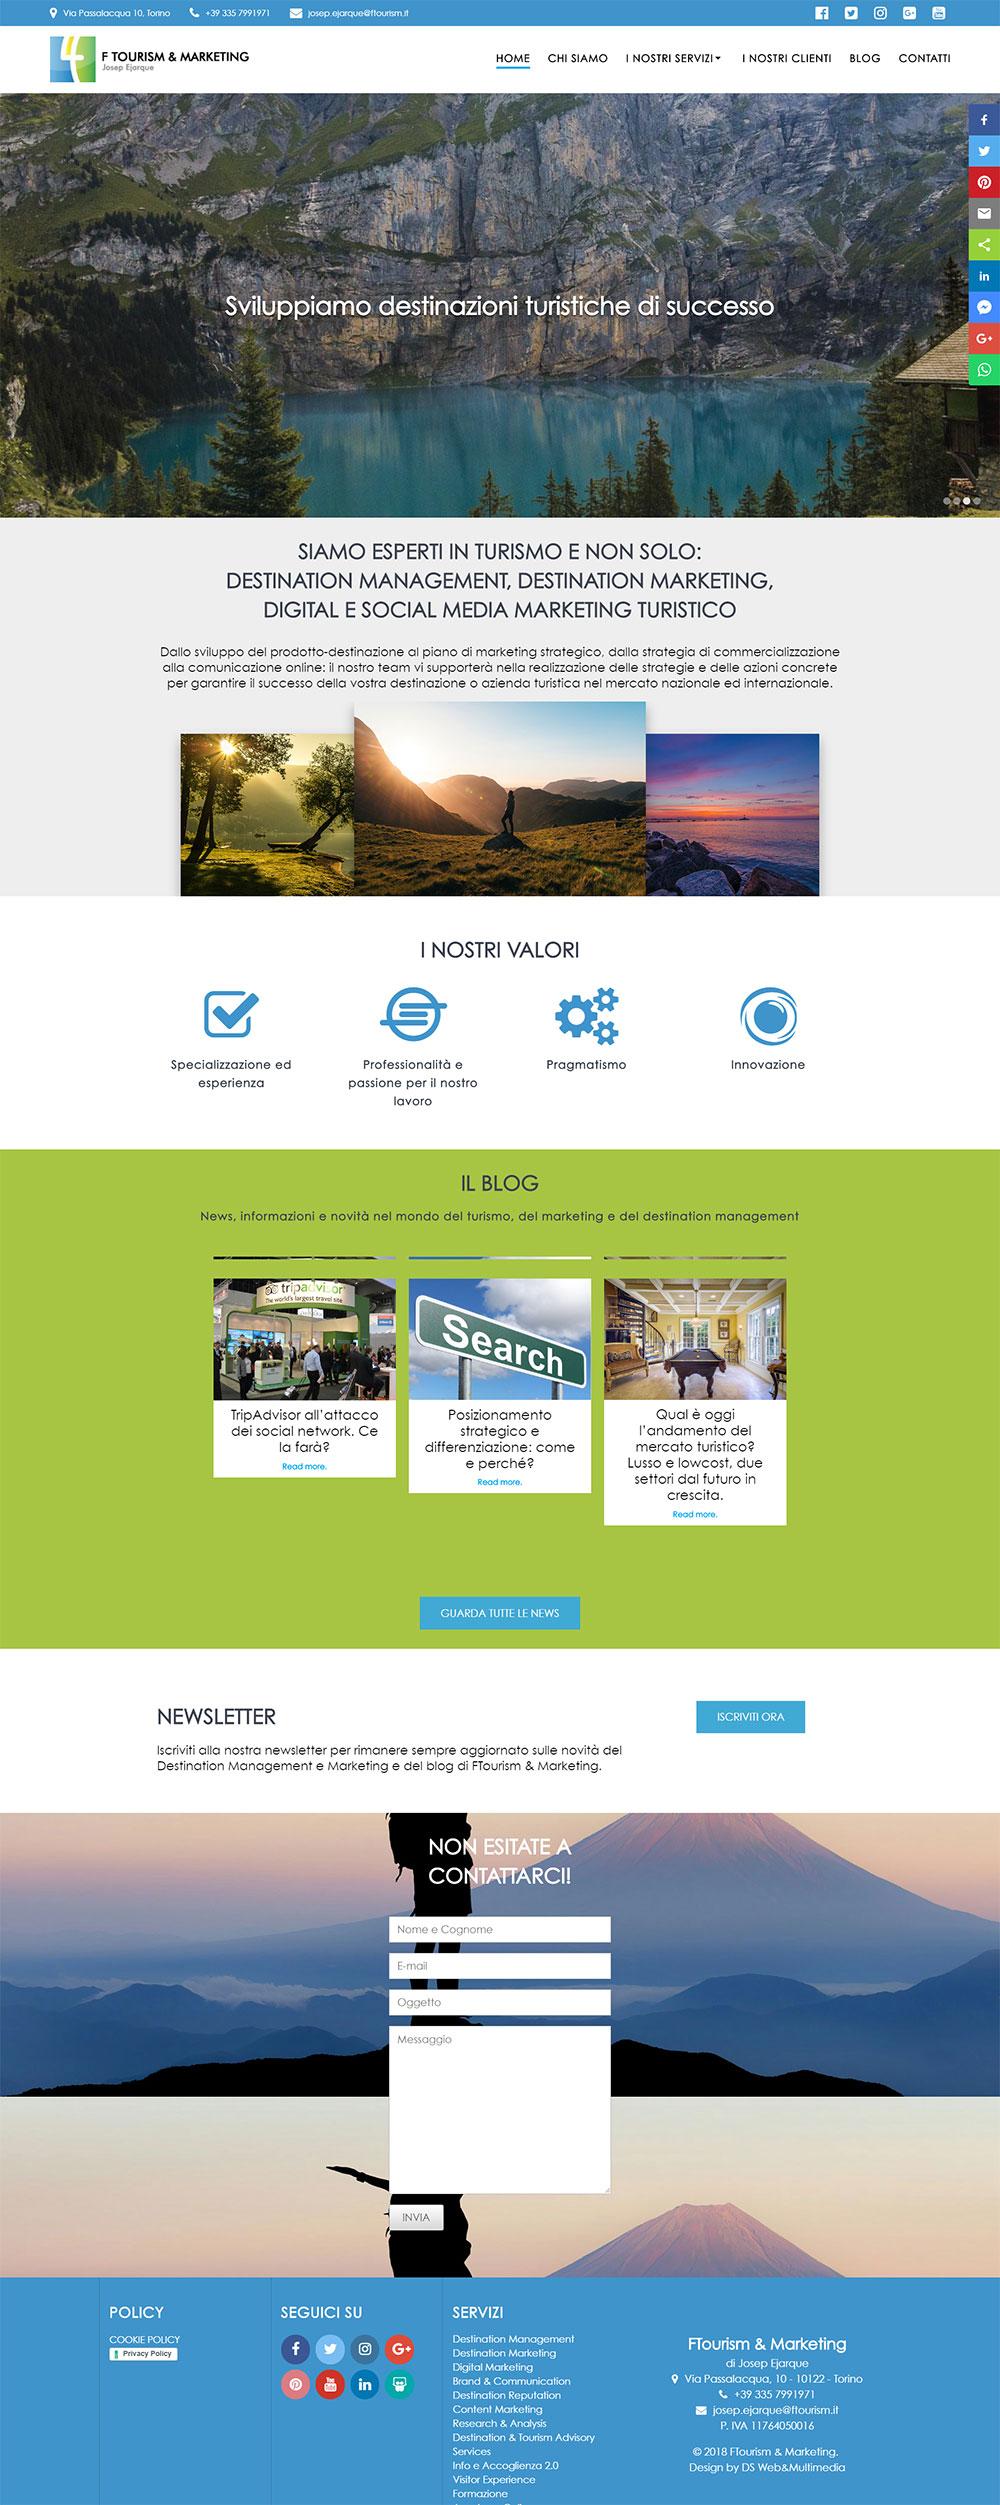 FTourism-sito-web